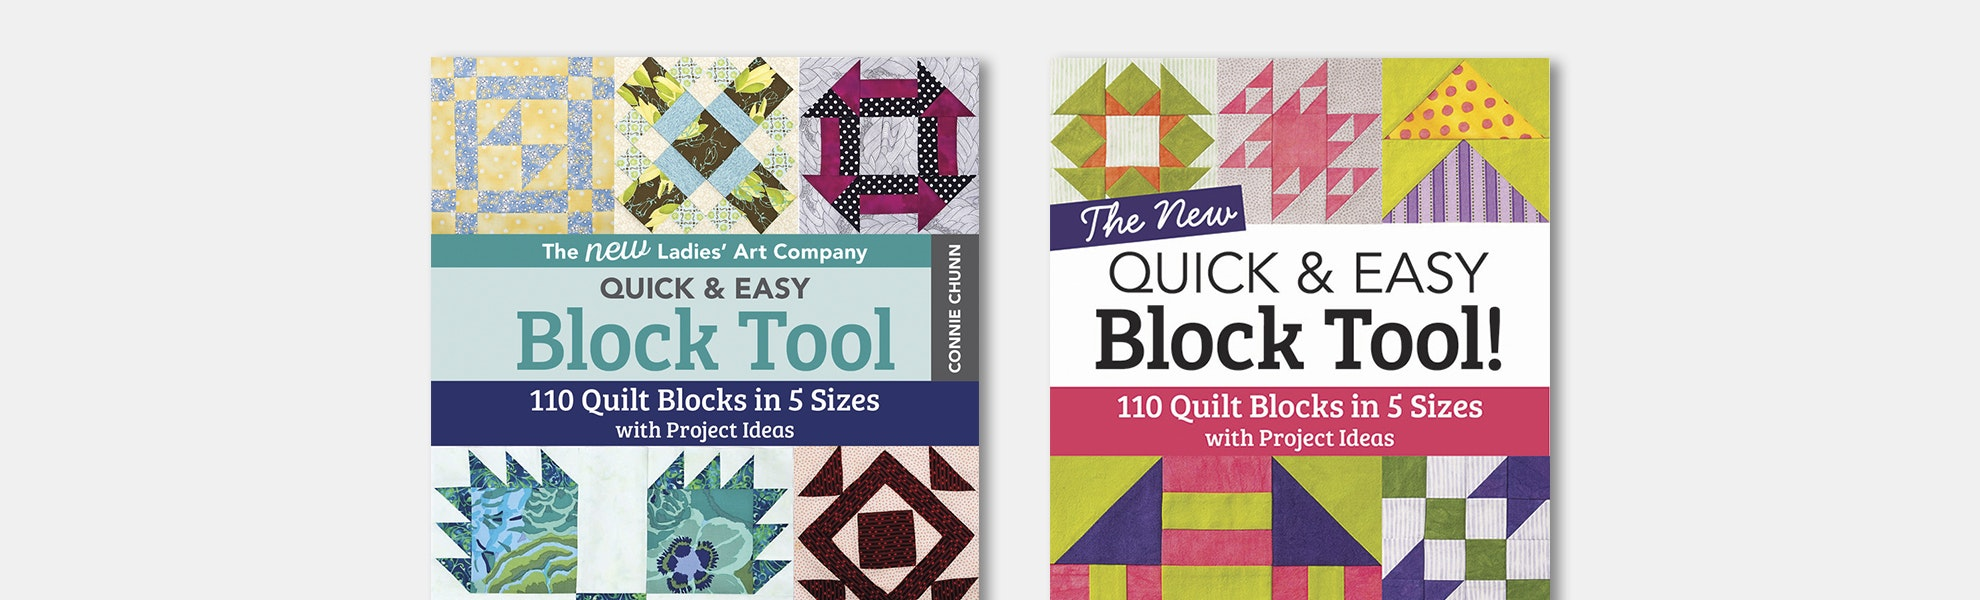 Quick & Easy Block Tool Book Bundle